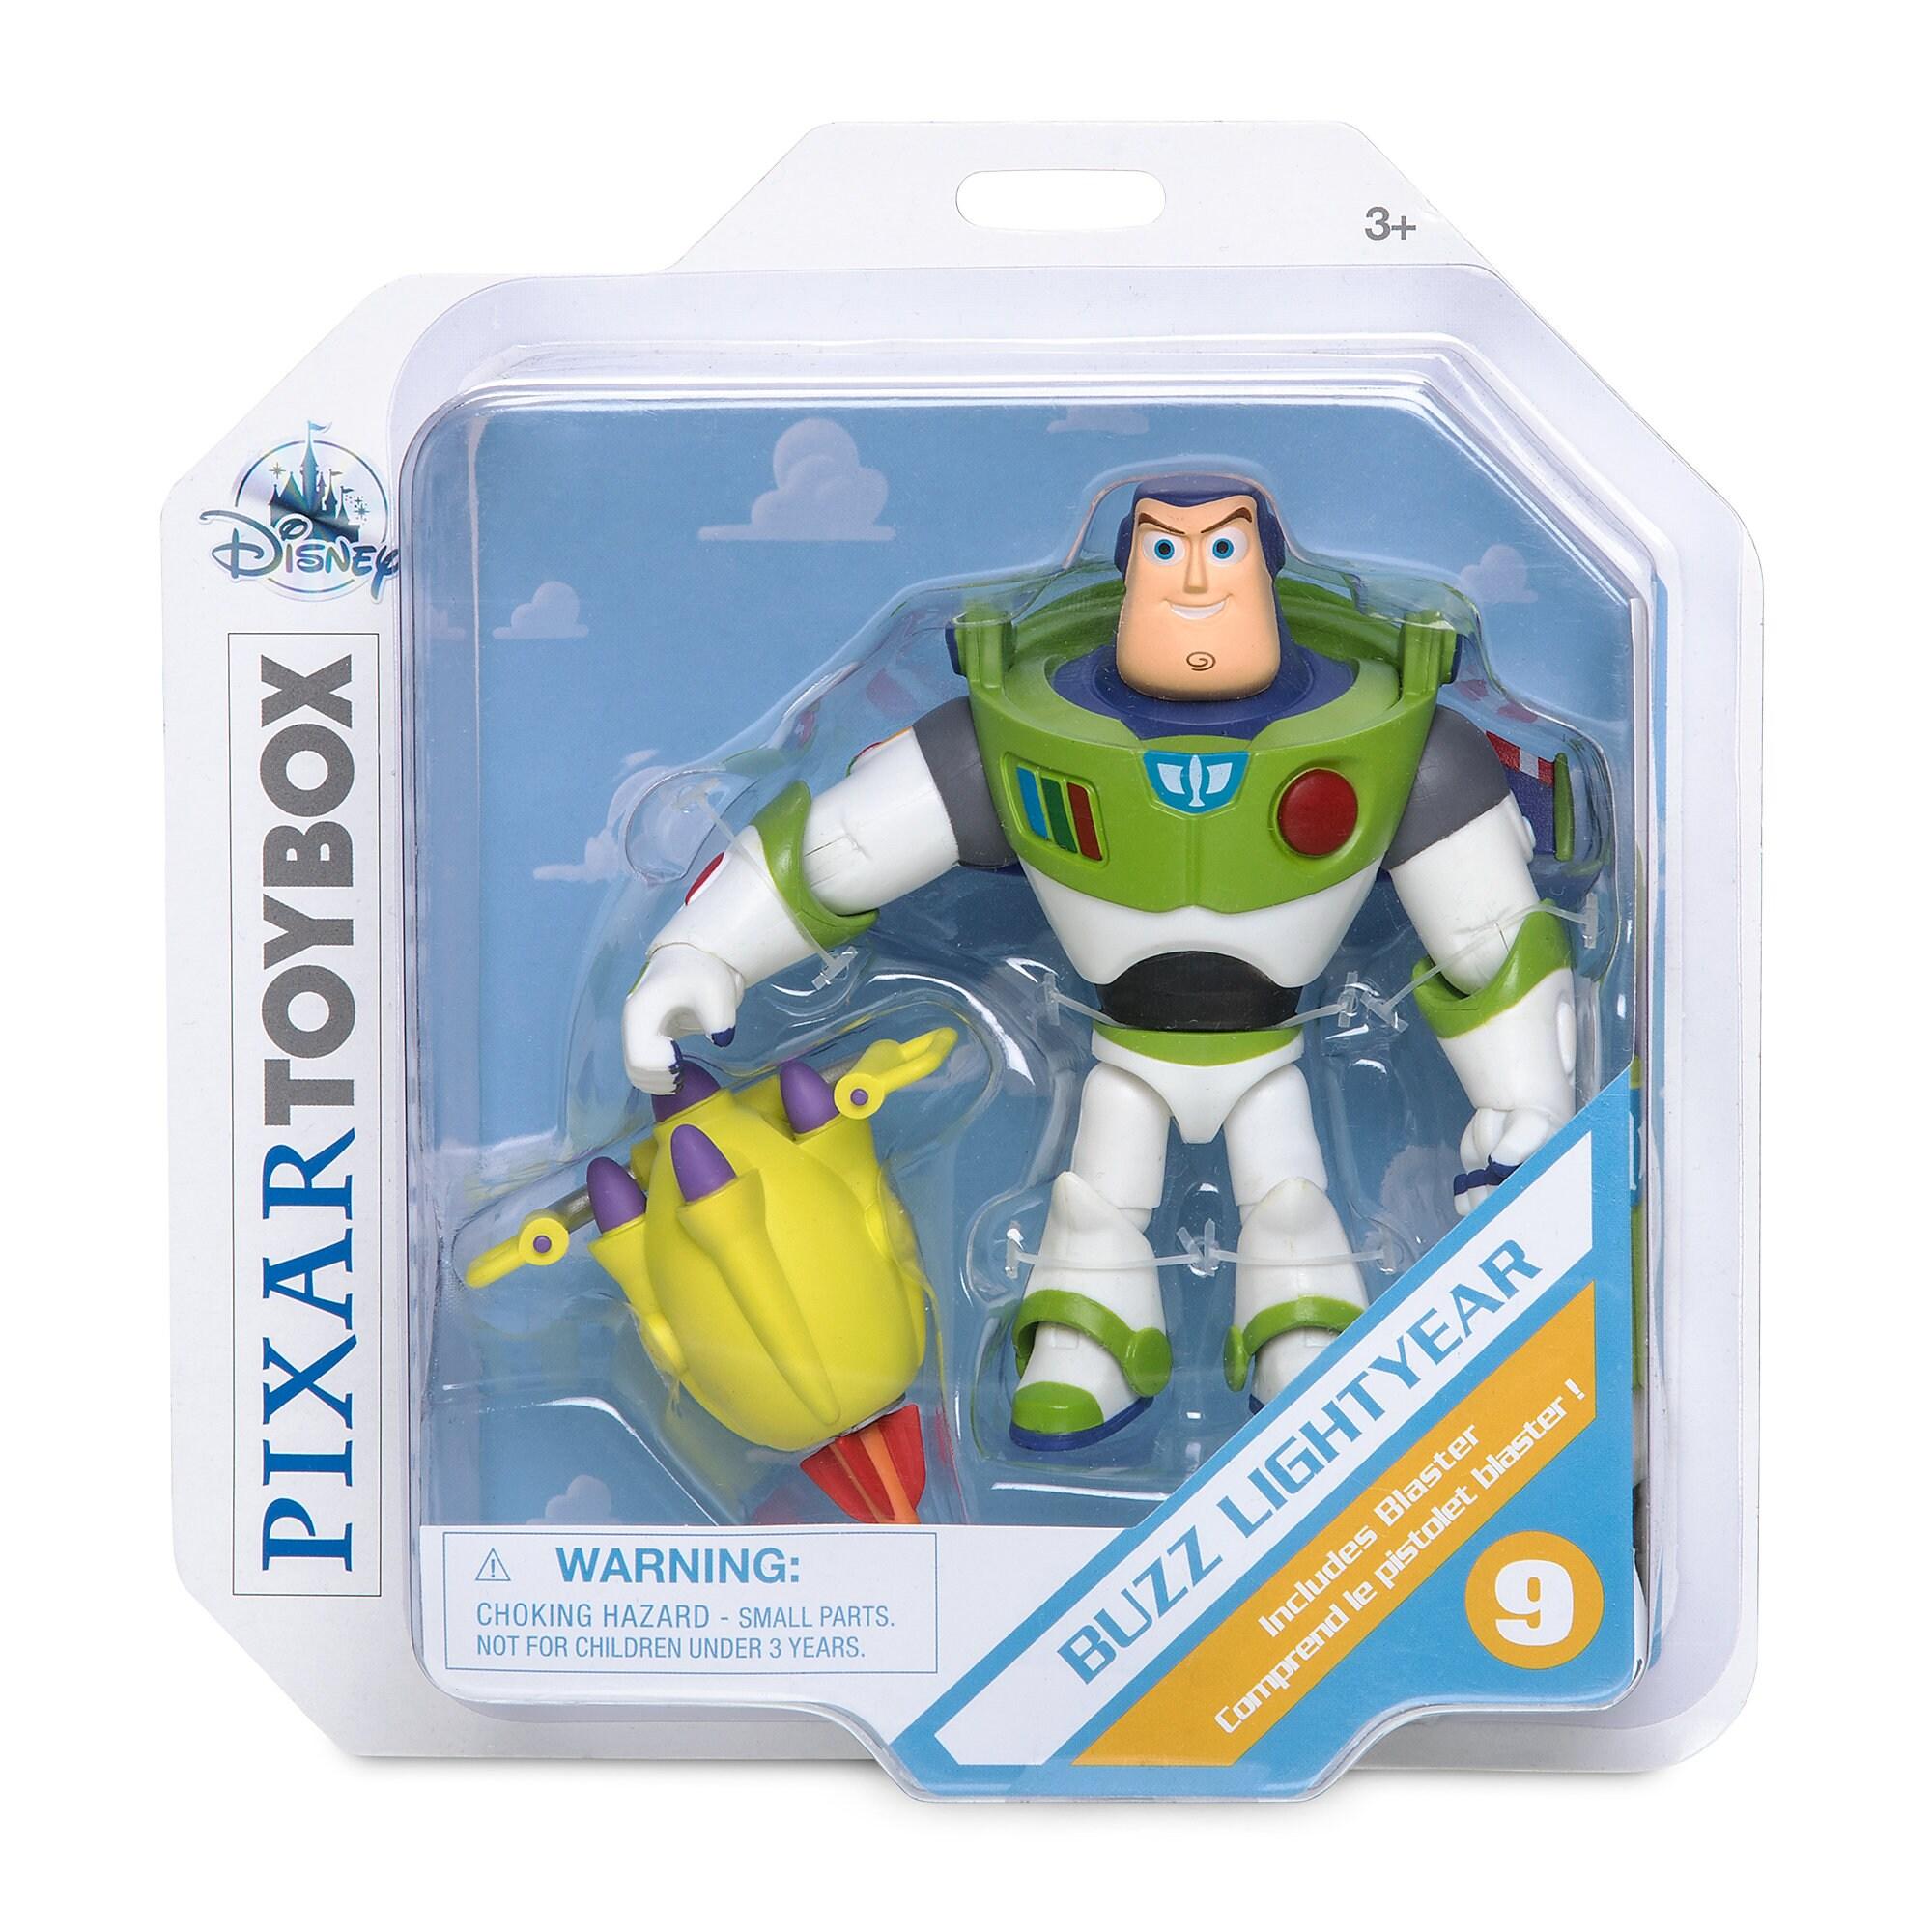 Buzz Lightyear Action Figure - Toy Story 4 - PIXAR Toybox